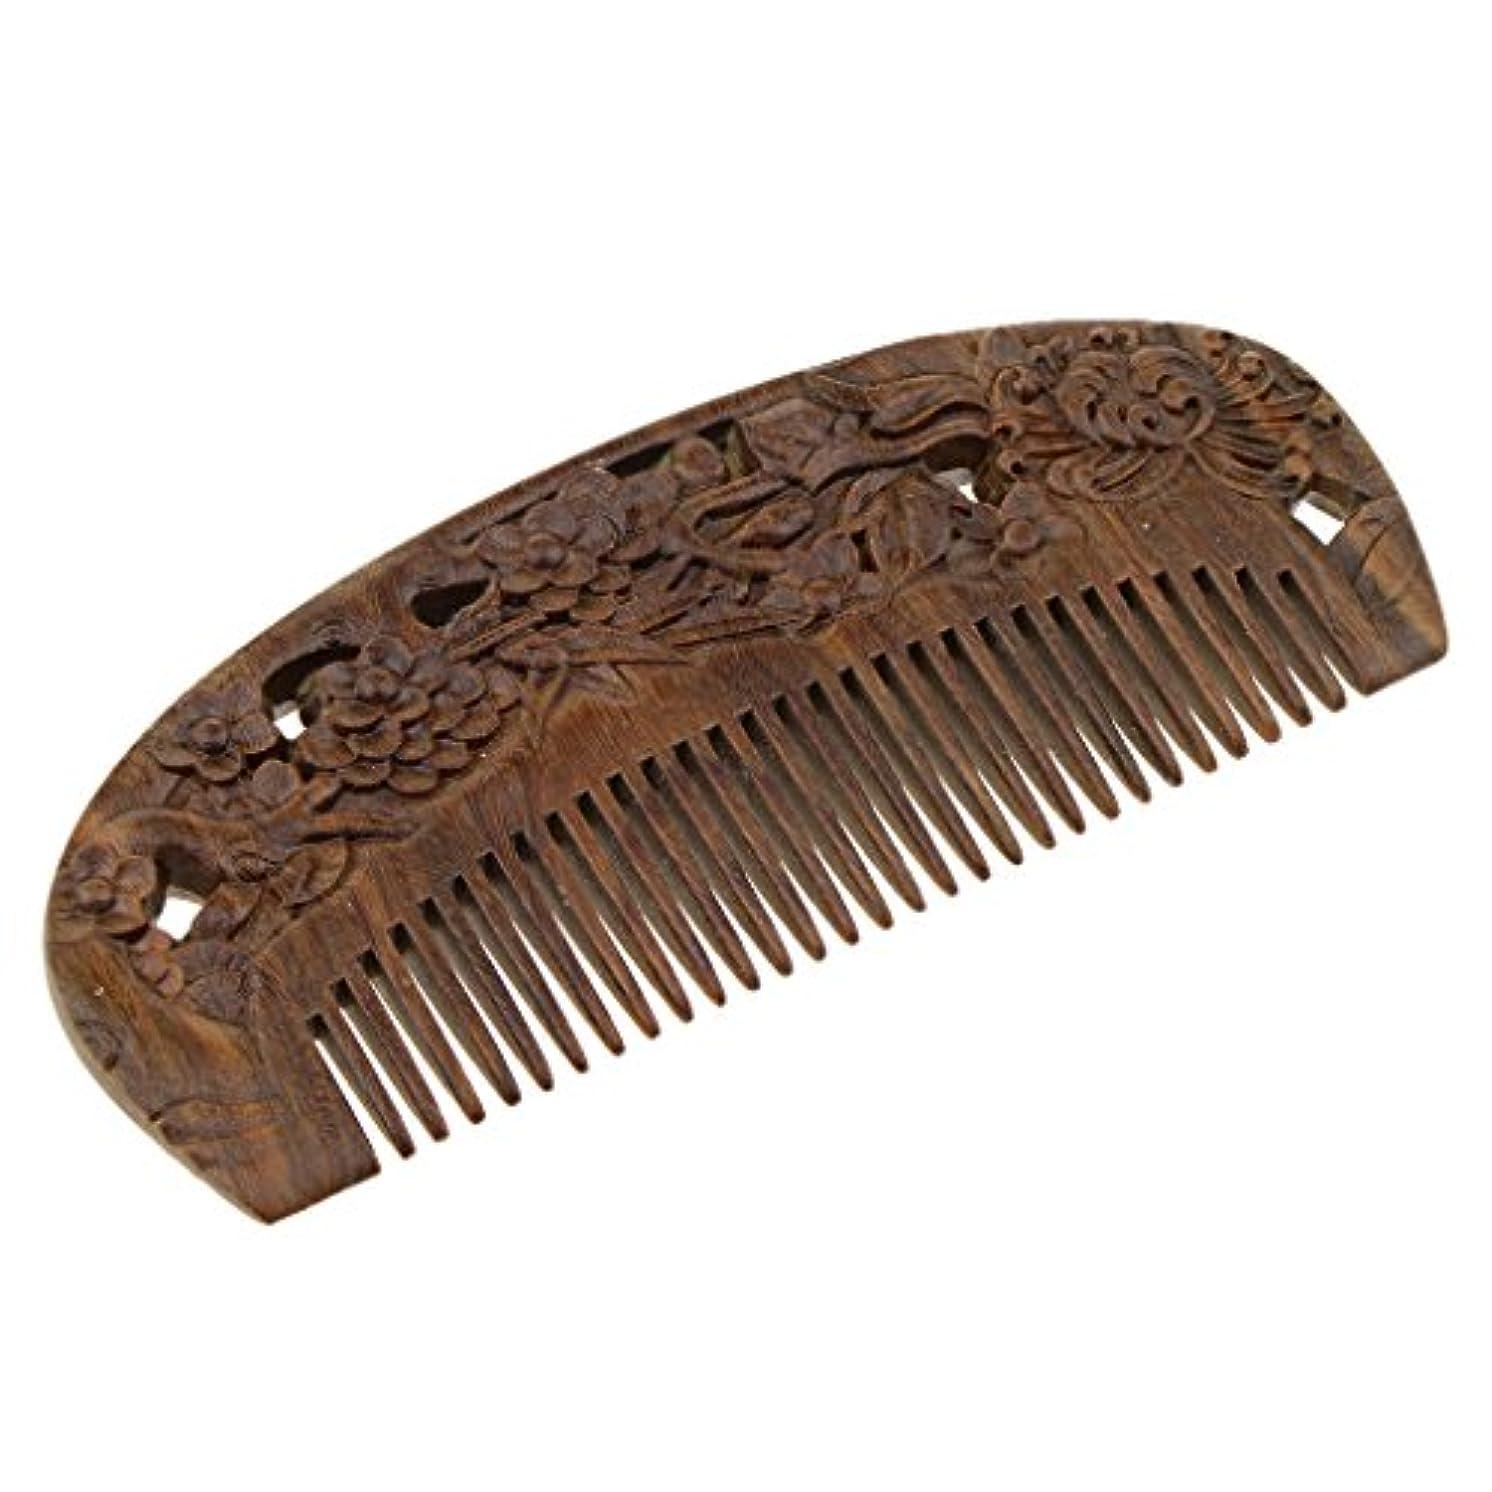 Perfk ヘアコーム 木製櫛 頭皮マッサージ 櫛 ヘアスタイリング 高品質 2タイプ選べる - #2